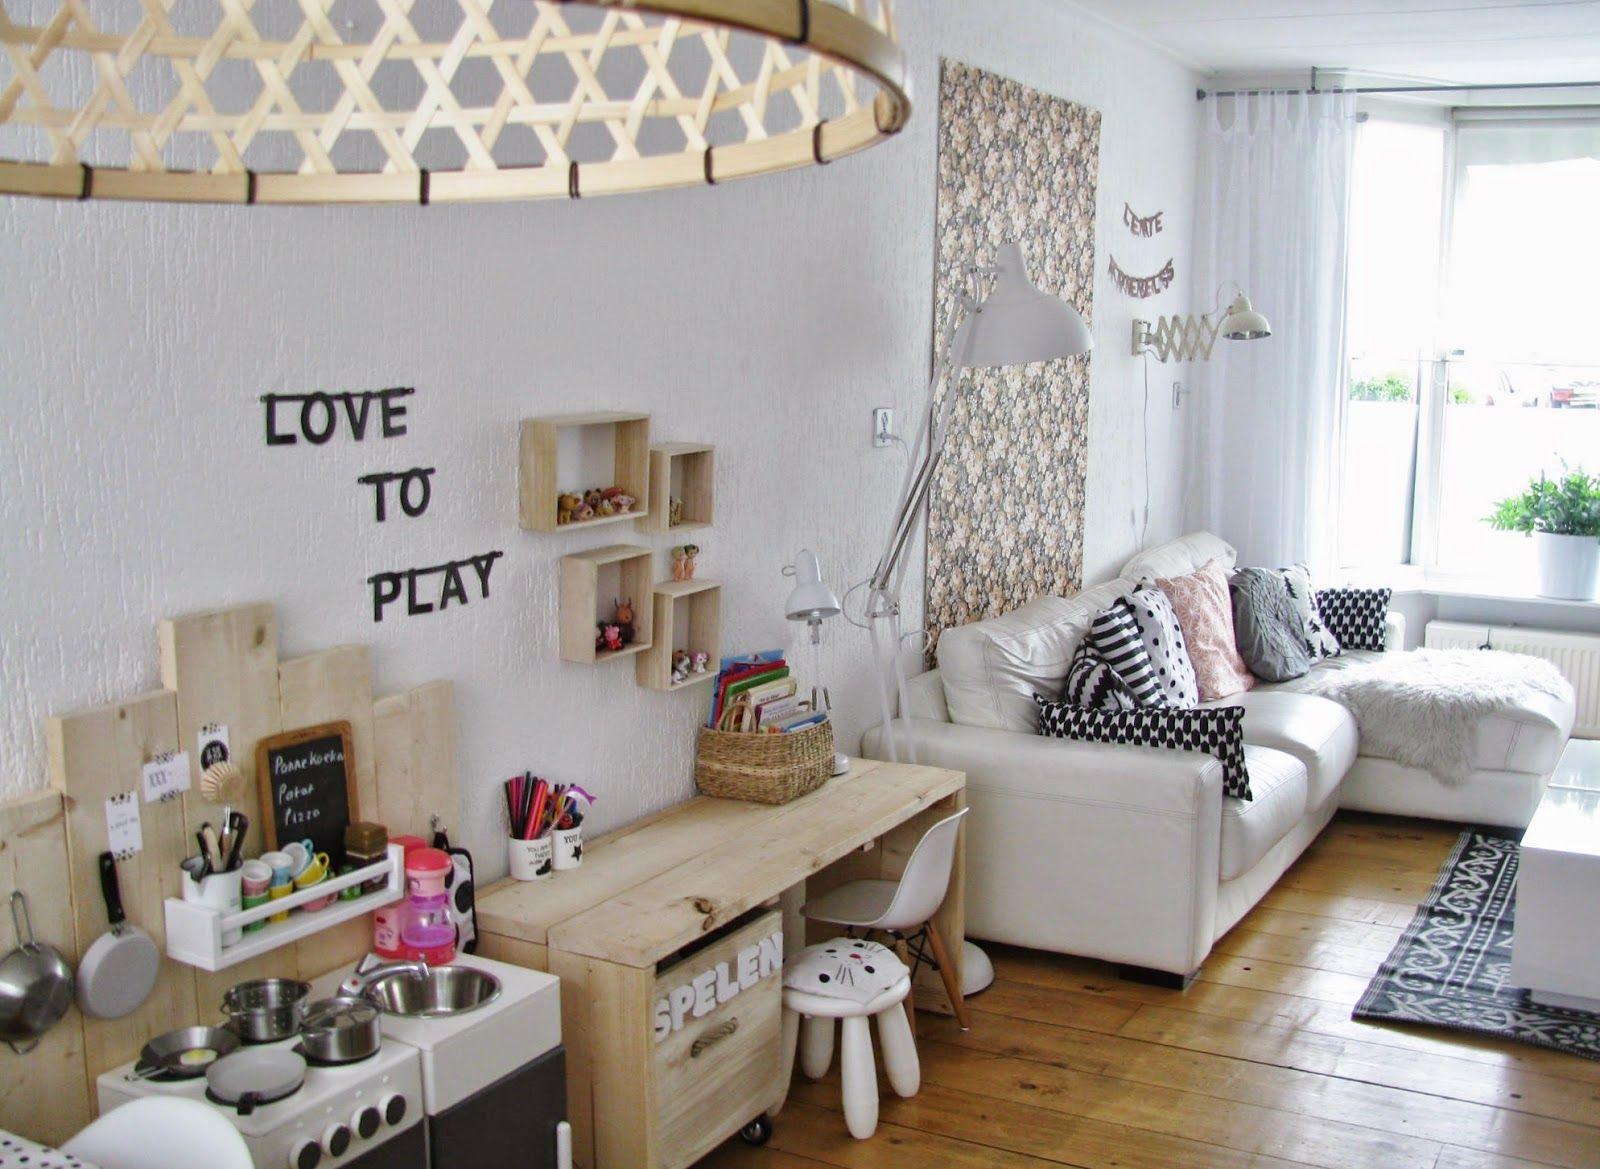 speelhoek woonkamer - google zoeken | speelhoek | pinterest | play, Deco ideeën